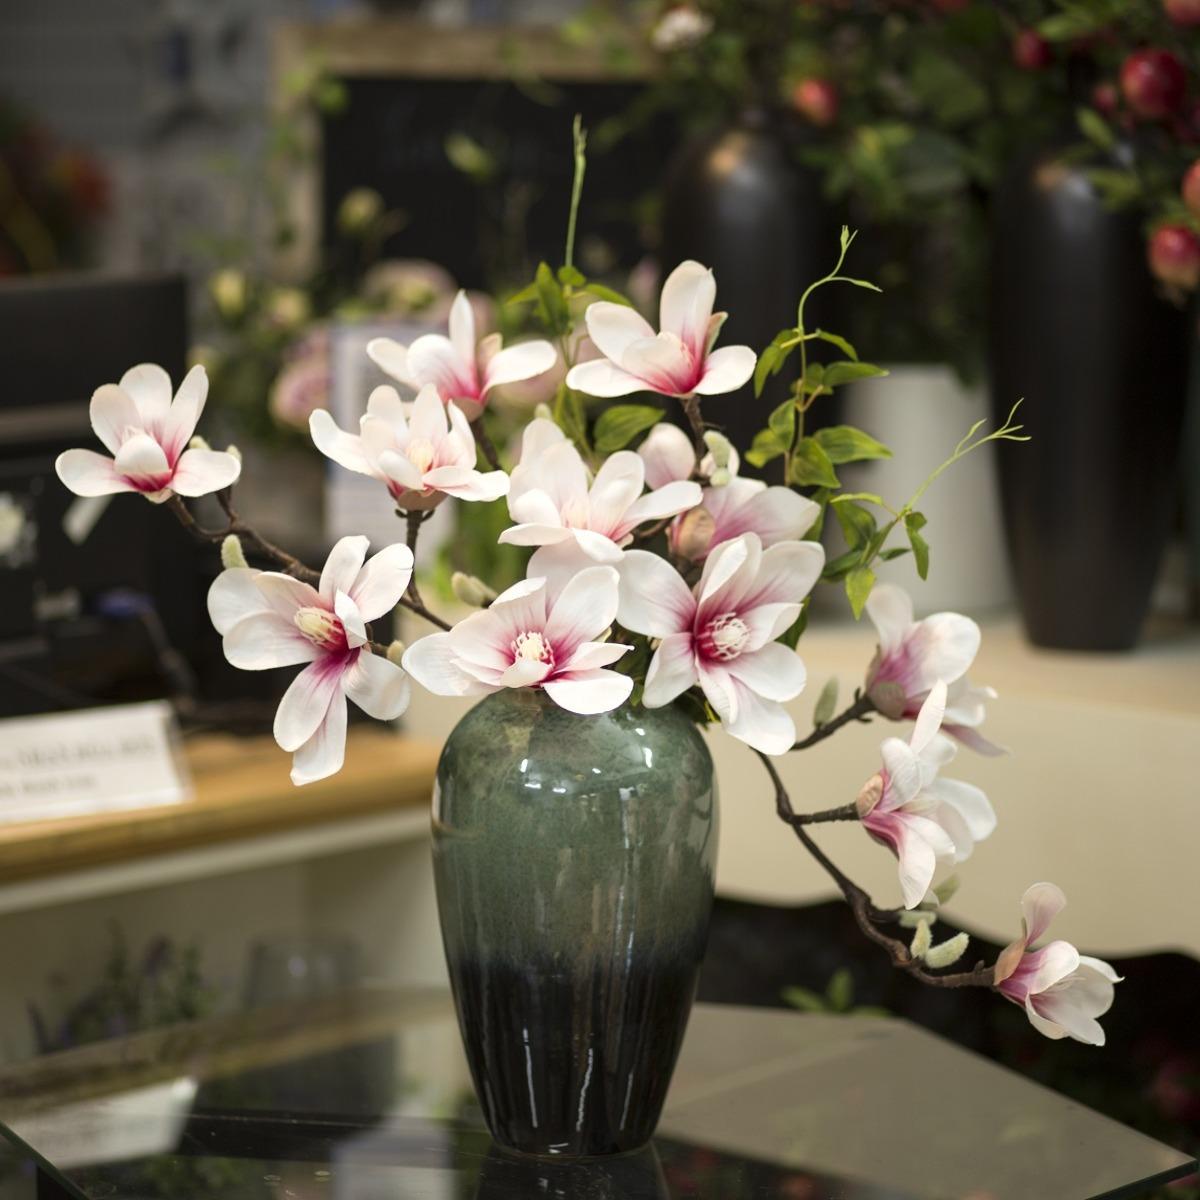 Bình hoa mộc lan cao 40cm - BH763